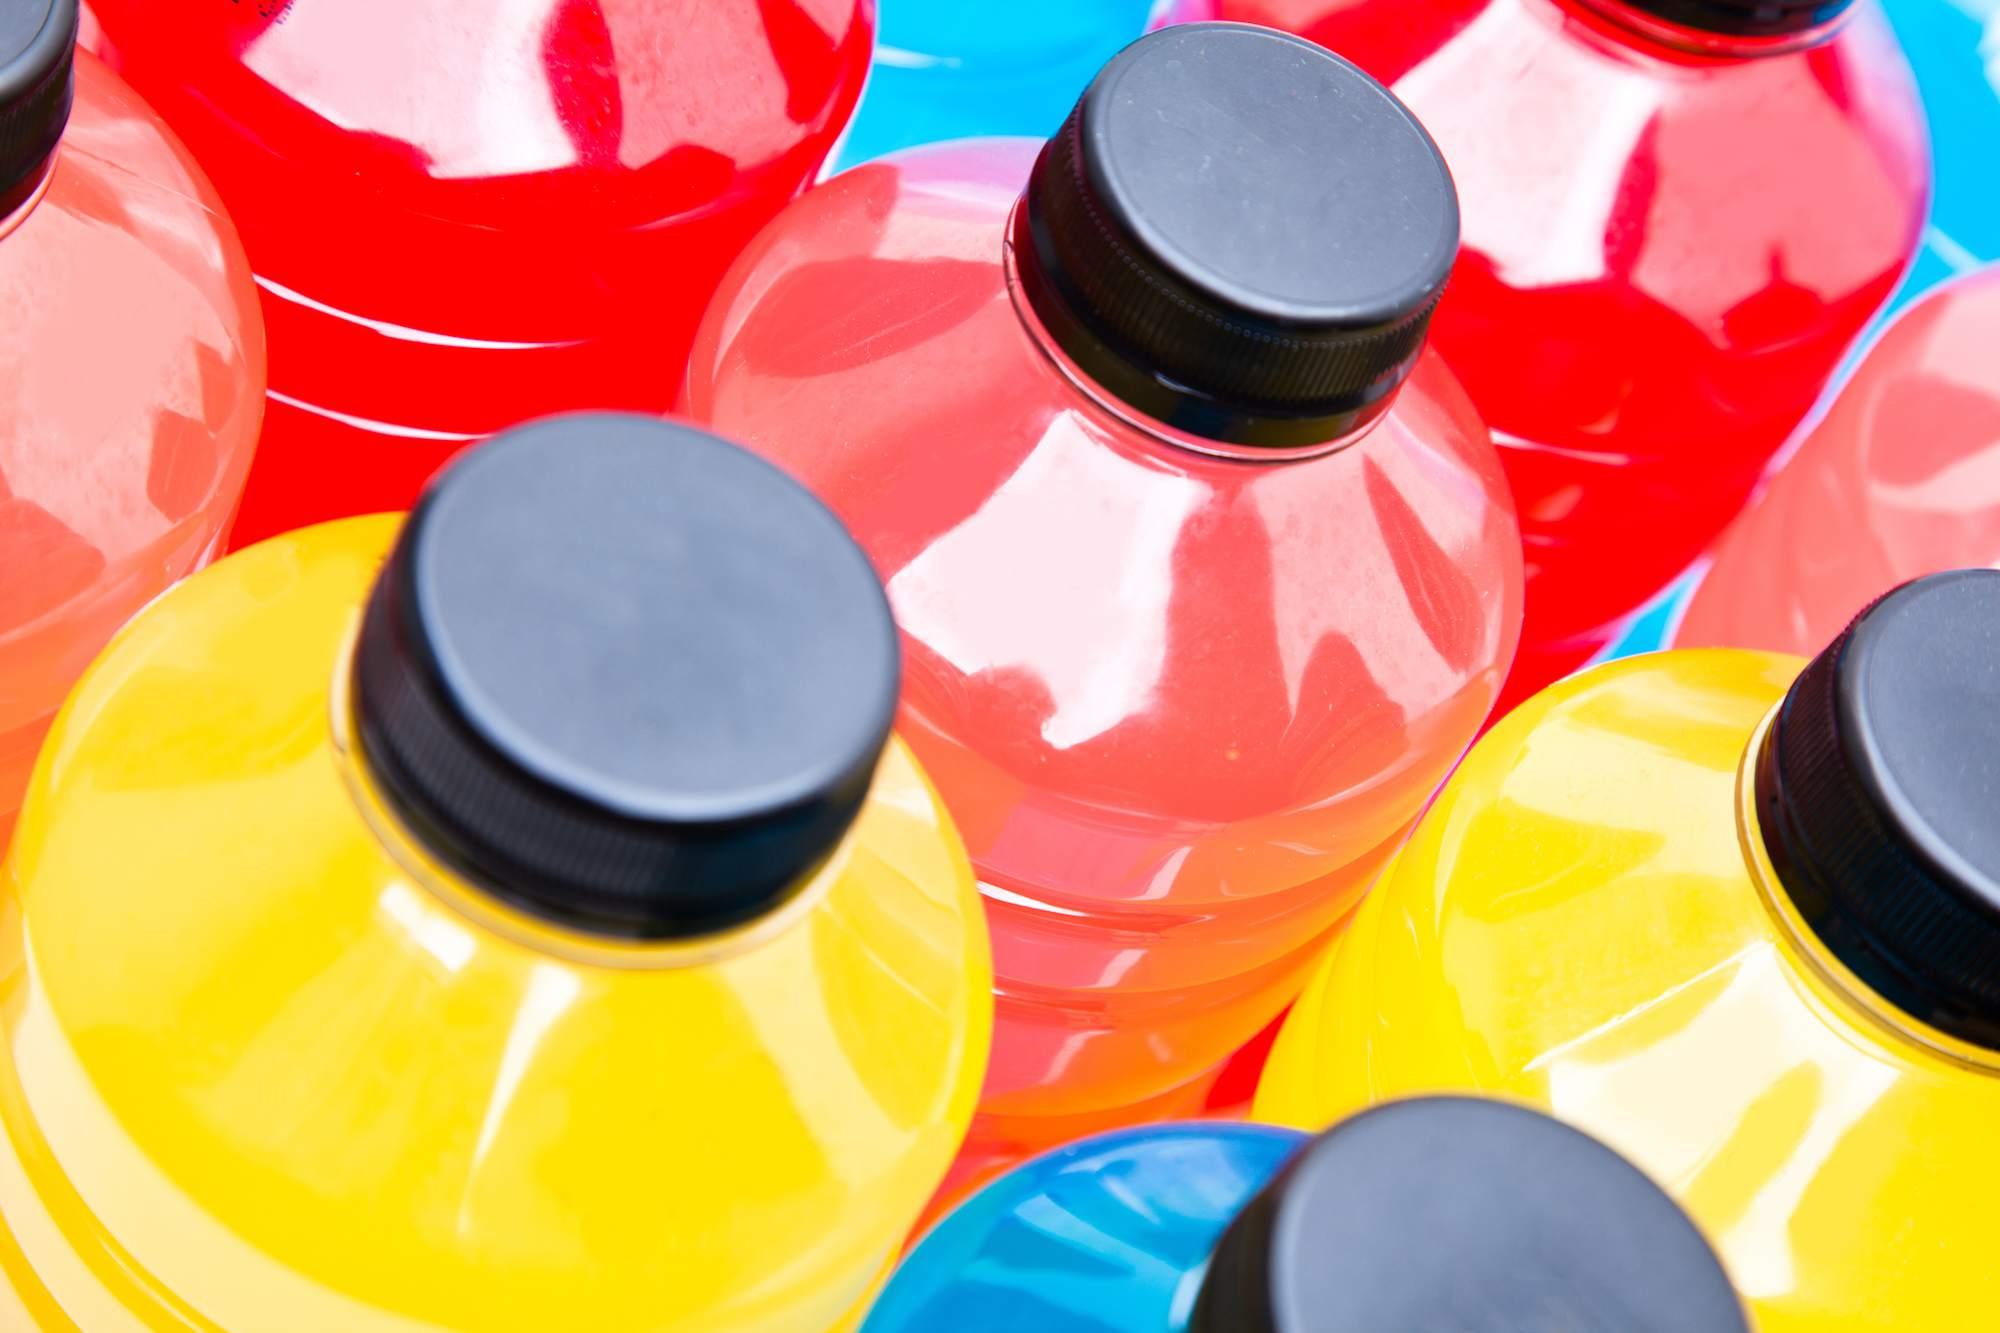 Multiple colorful bottles of sports drink